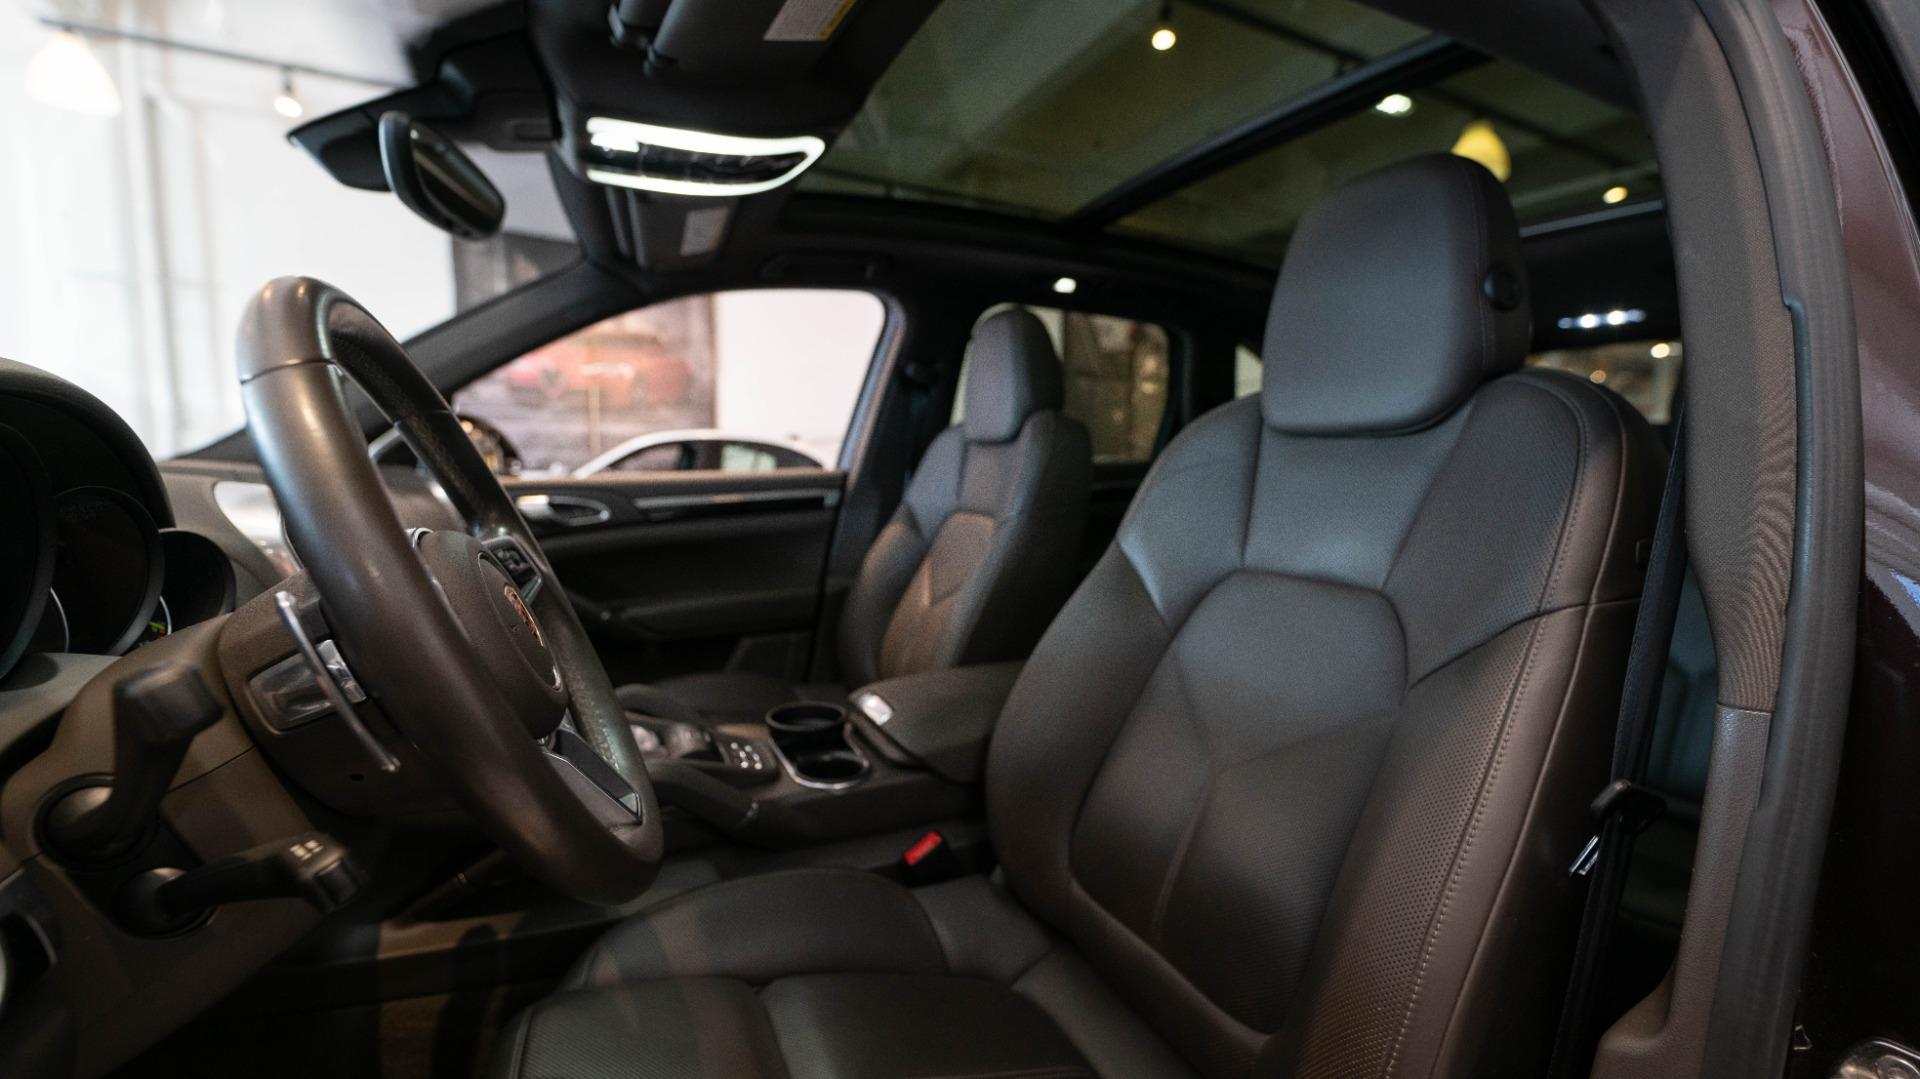 Used 2016 Porsche Cayenne S E Hybrid